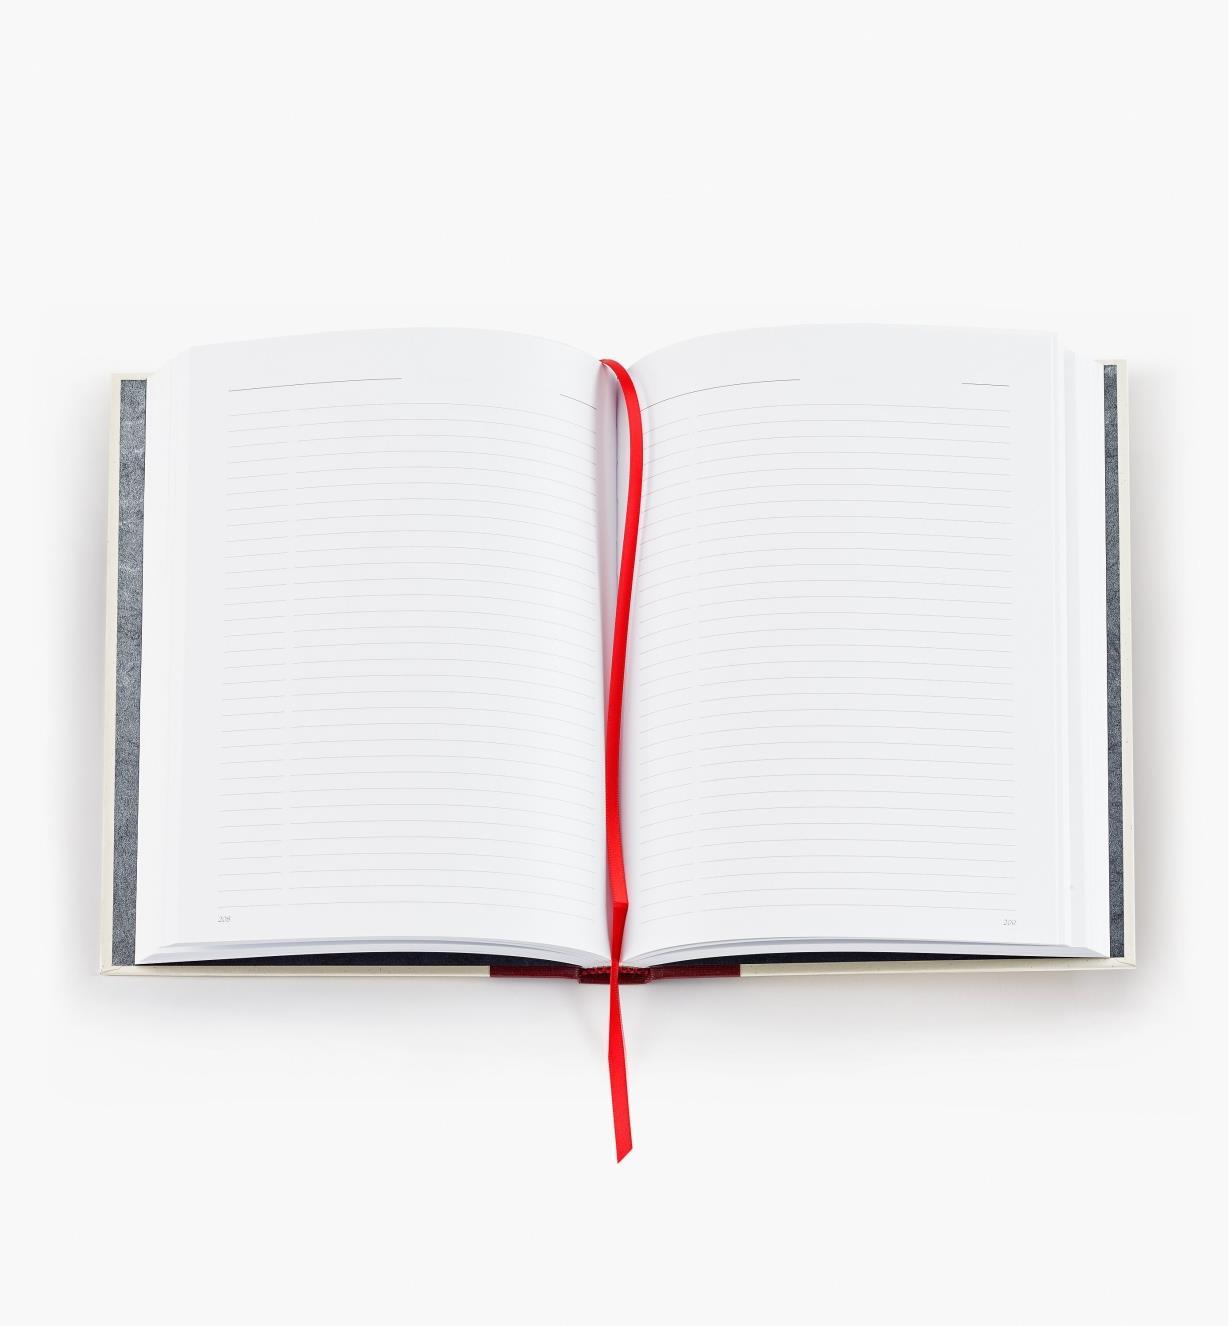 49L0795 - Everyman's Journal